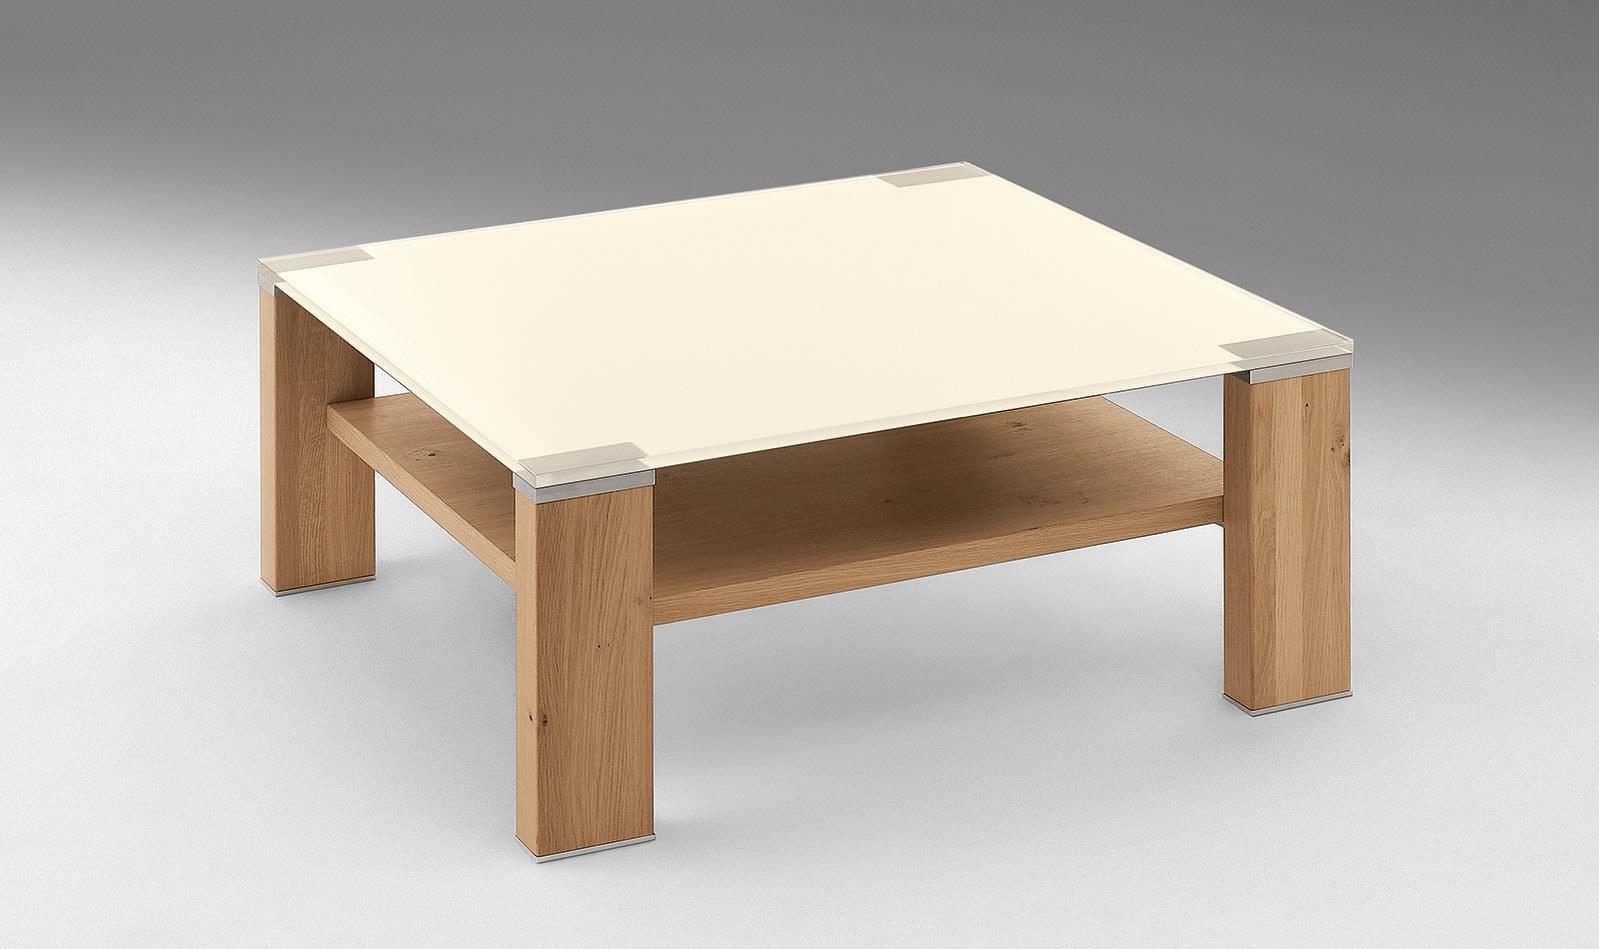 Moderner Couchtisch Holz Glas Rechteckig Ct484 Alfons